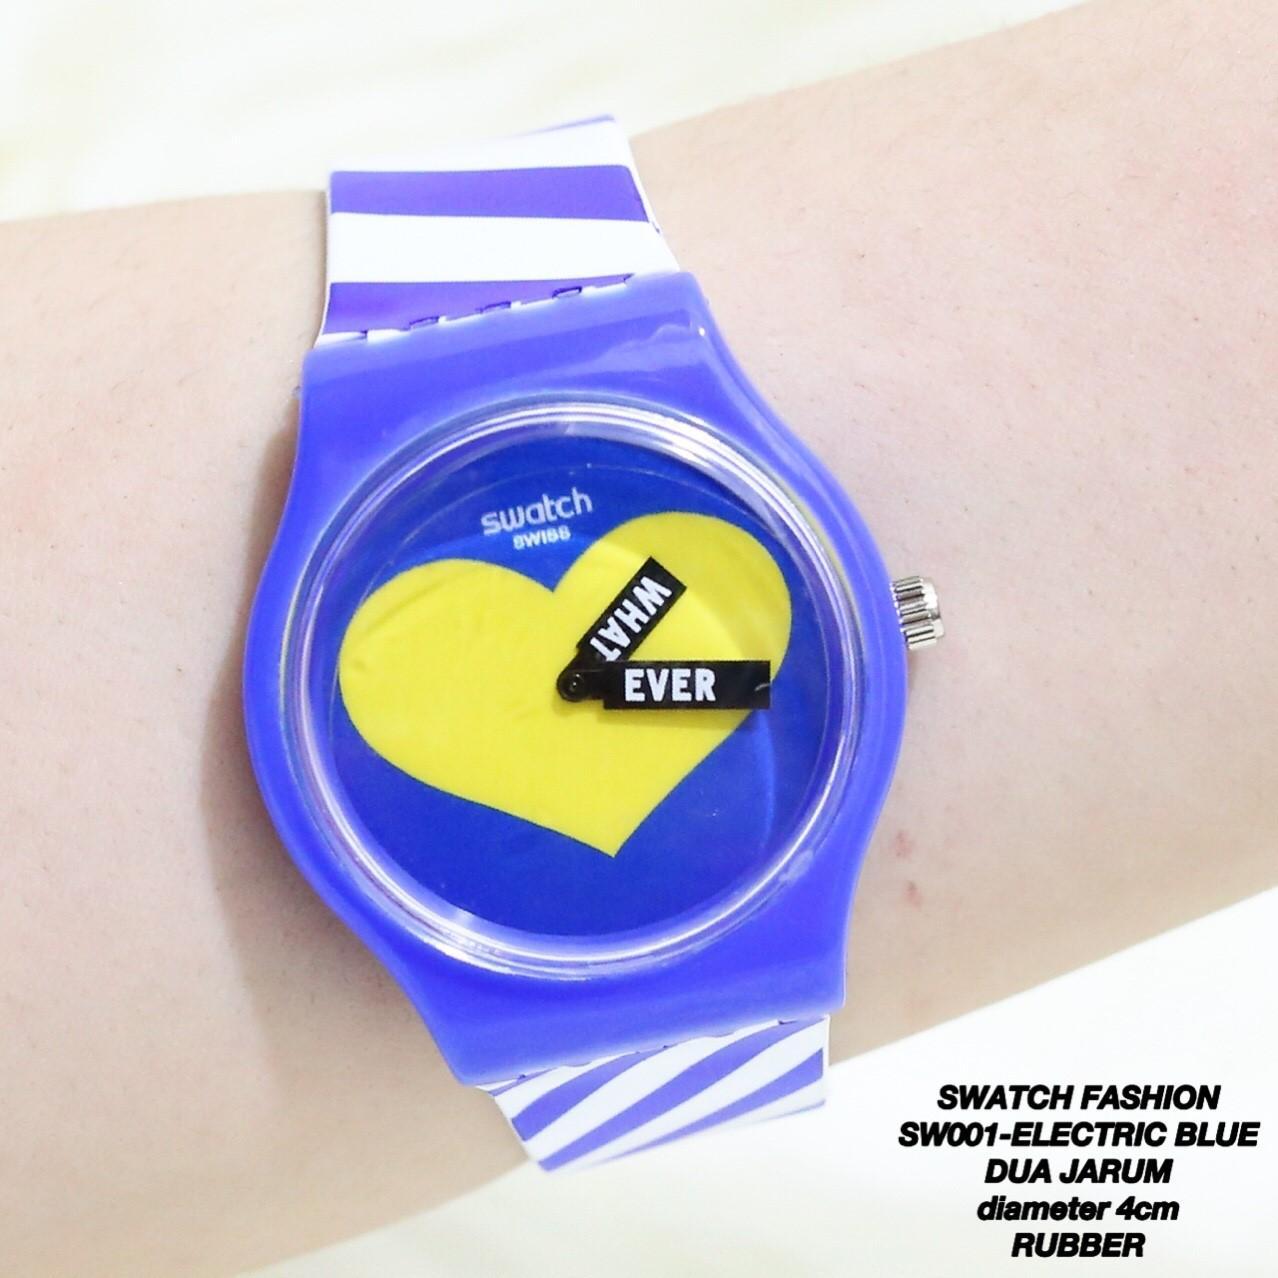 Buy Sell Cheapest Guess Wanita Karet Best Quality Product Deals W0562l2 Chronograph Jam Tangan Biru Swatch Fashion Ruber Grosir Termurah